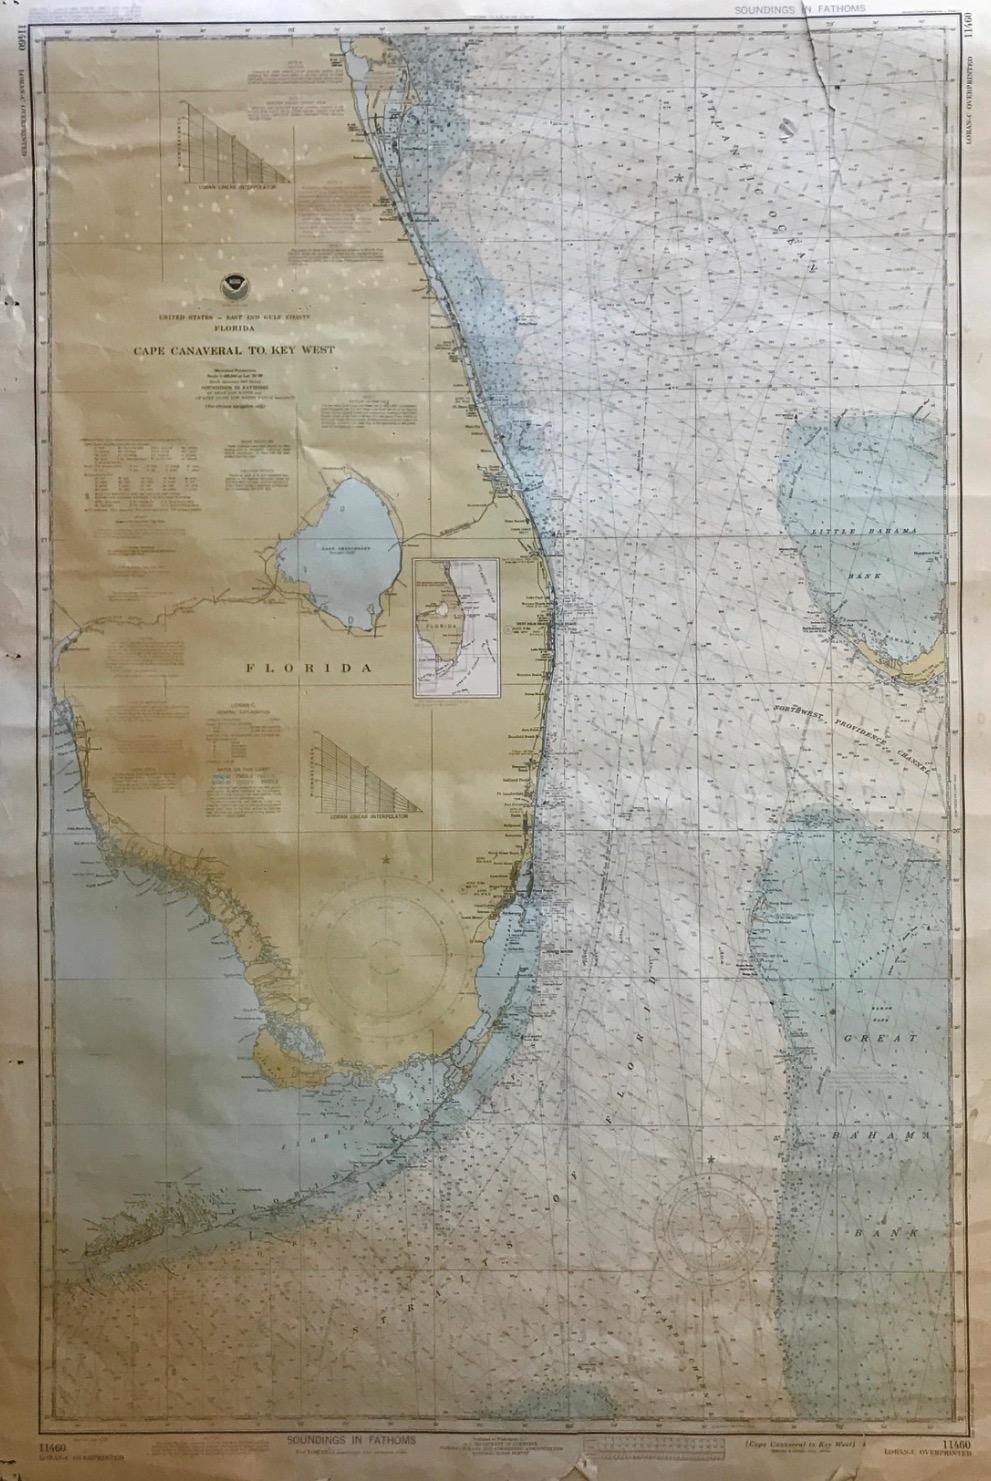 Vintage 1978 nautical chart